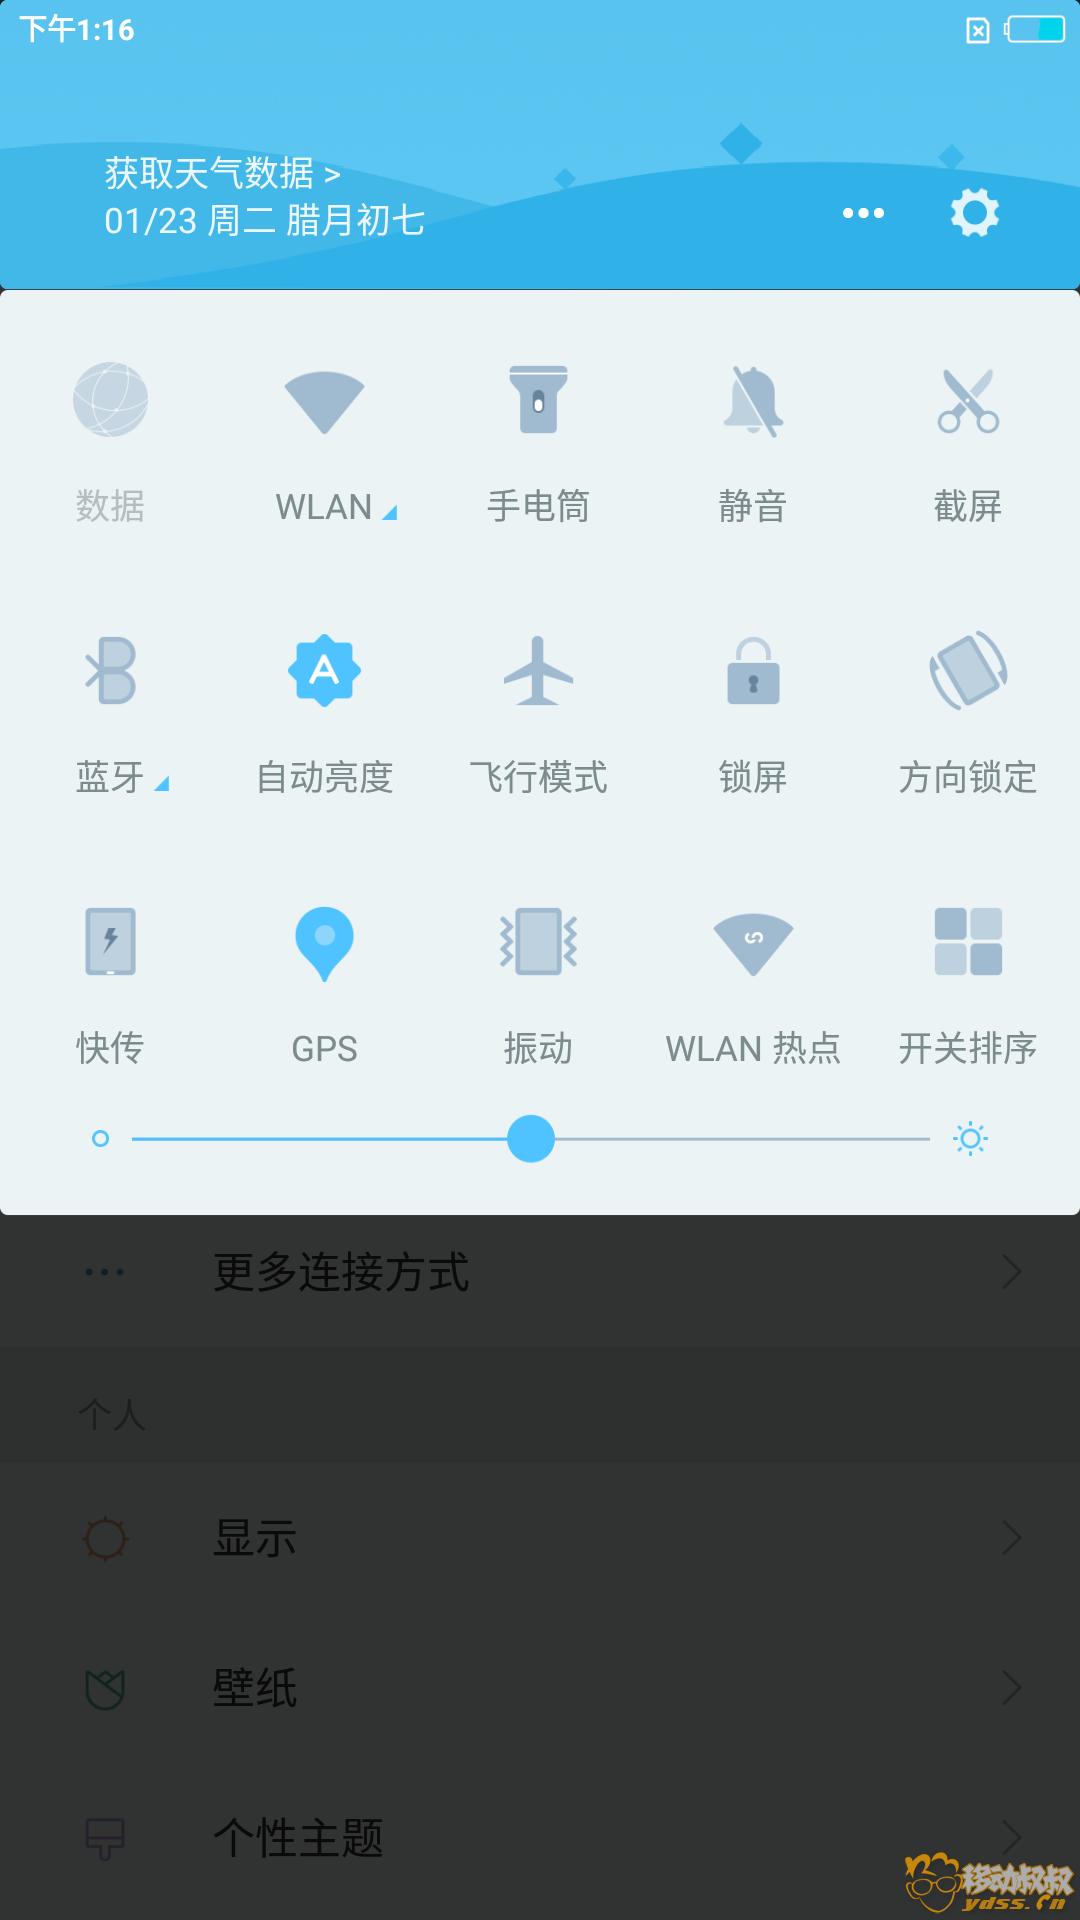 Screenshot_2018-01-23-13-16-26-332_com.android.settings.png